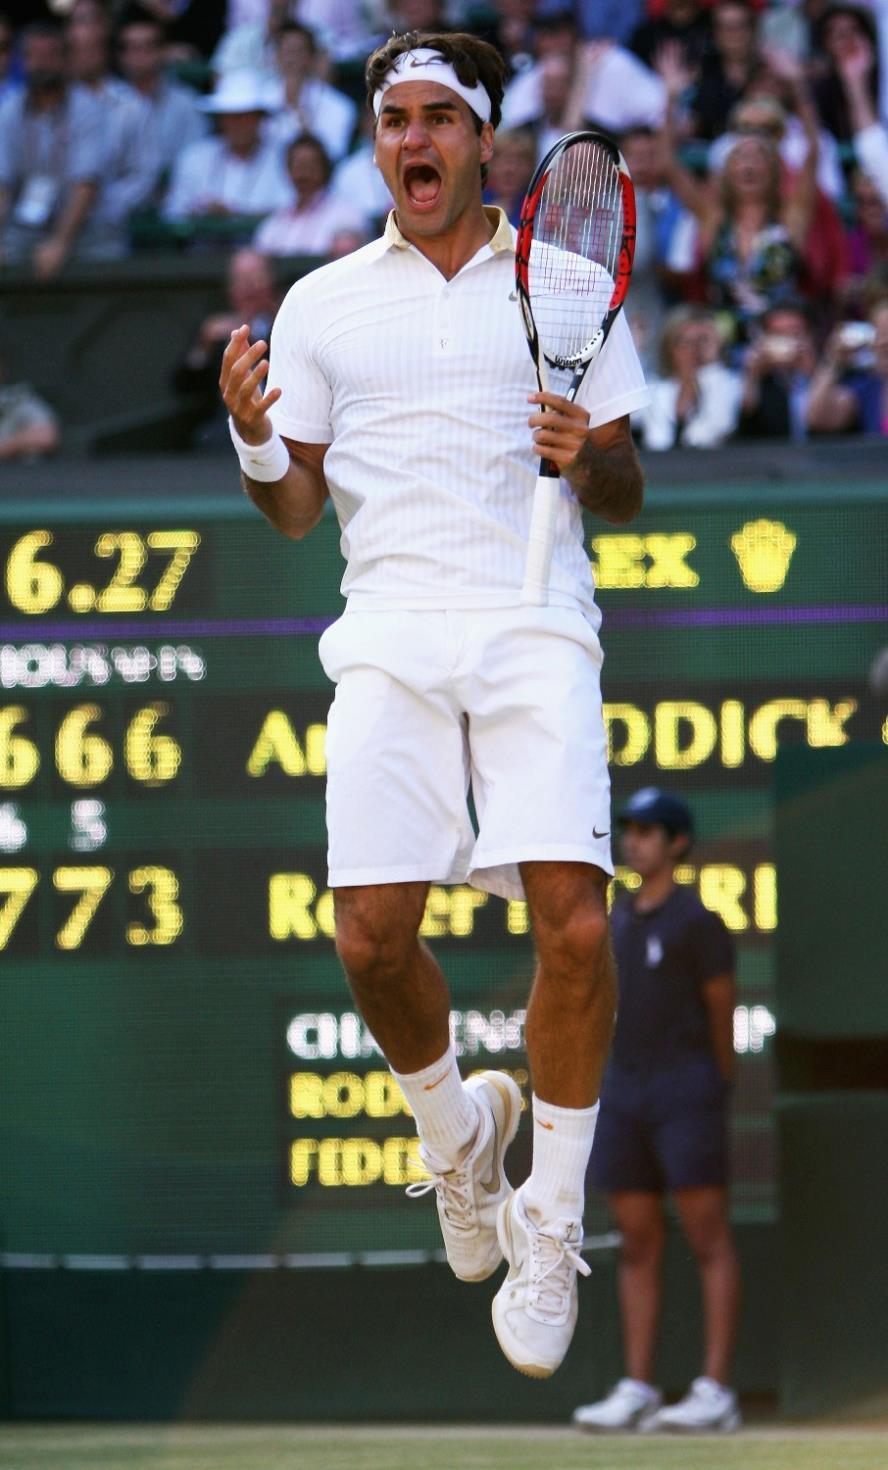 Roger Federer Tennis stern Aquarell inkjet Stoff poster 40